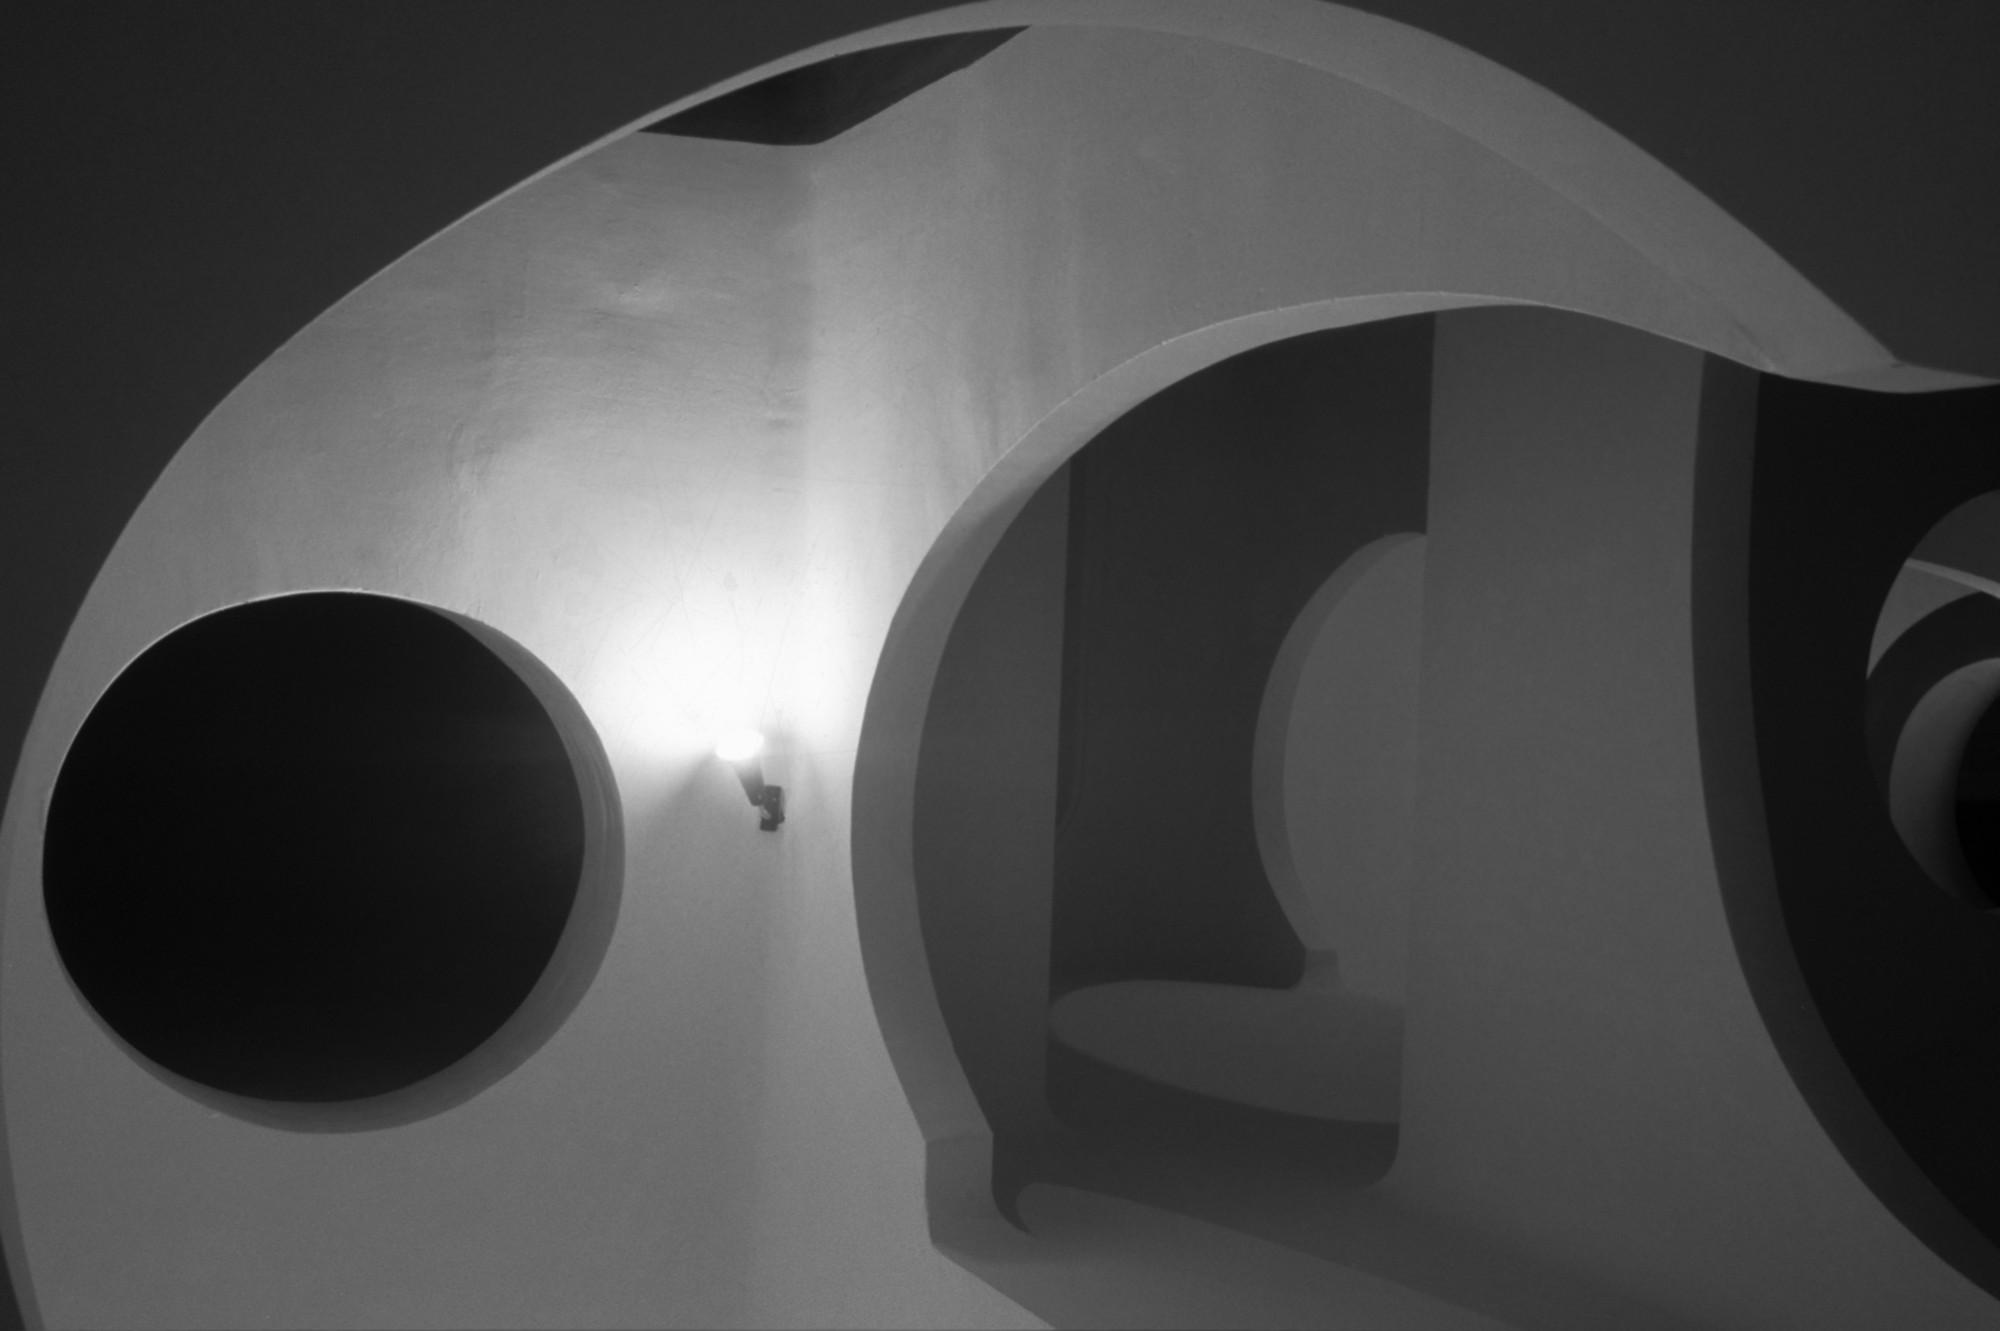 5116d2e6b3fc4b084300003d_ad-classics-xanad-ricardo-bofill_xanadu_calpe_spain_ricardo_bofill_taller_arquitectura_9.jpg